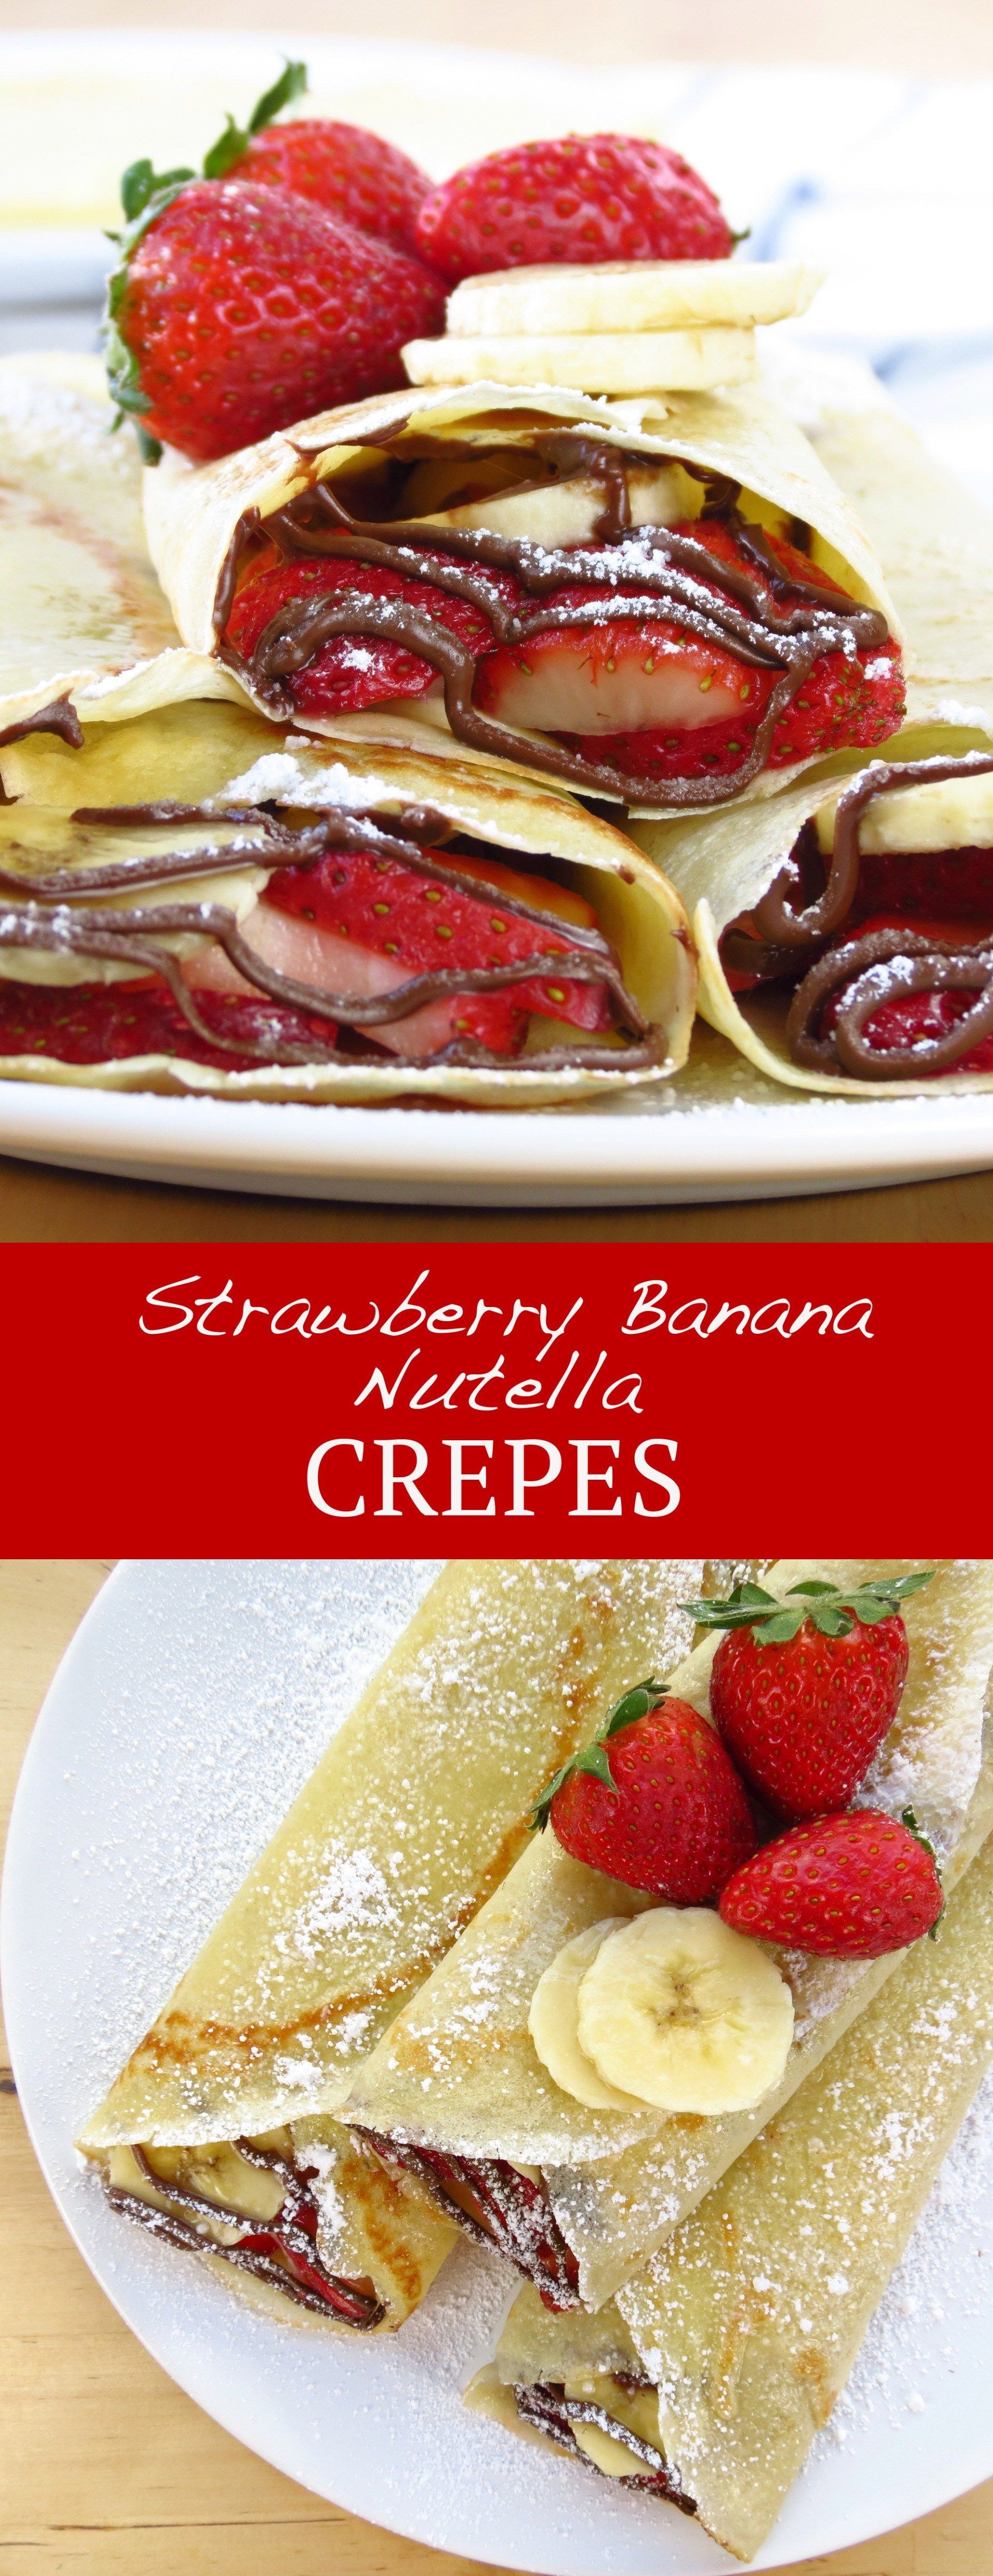 Strawberry Banana Nutella Crepes | Recipe | Nutella crepes ...